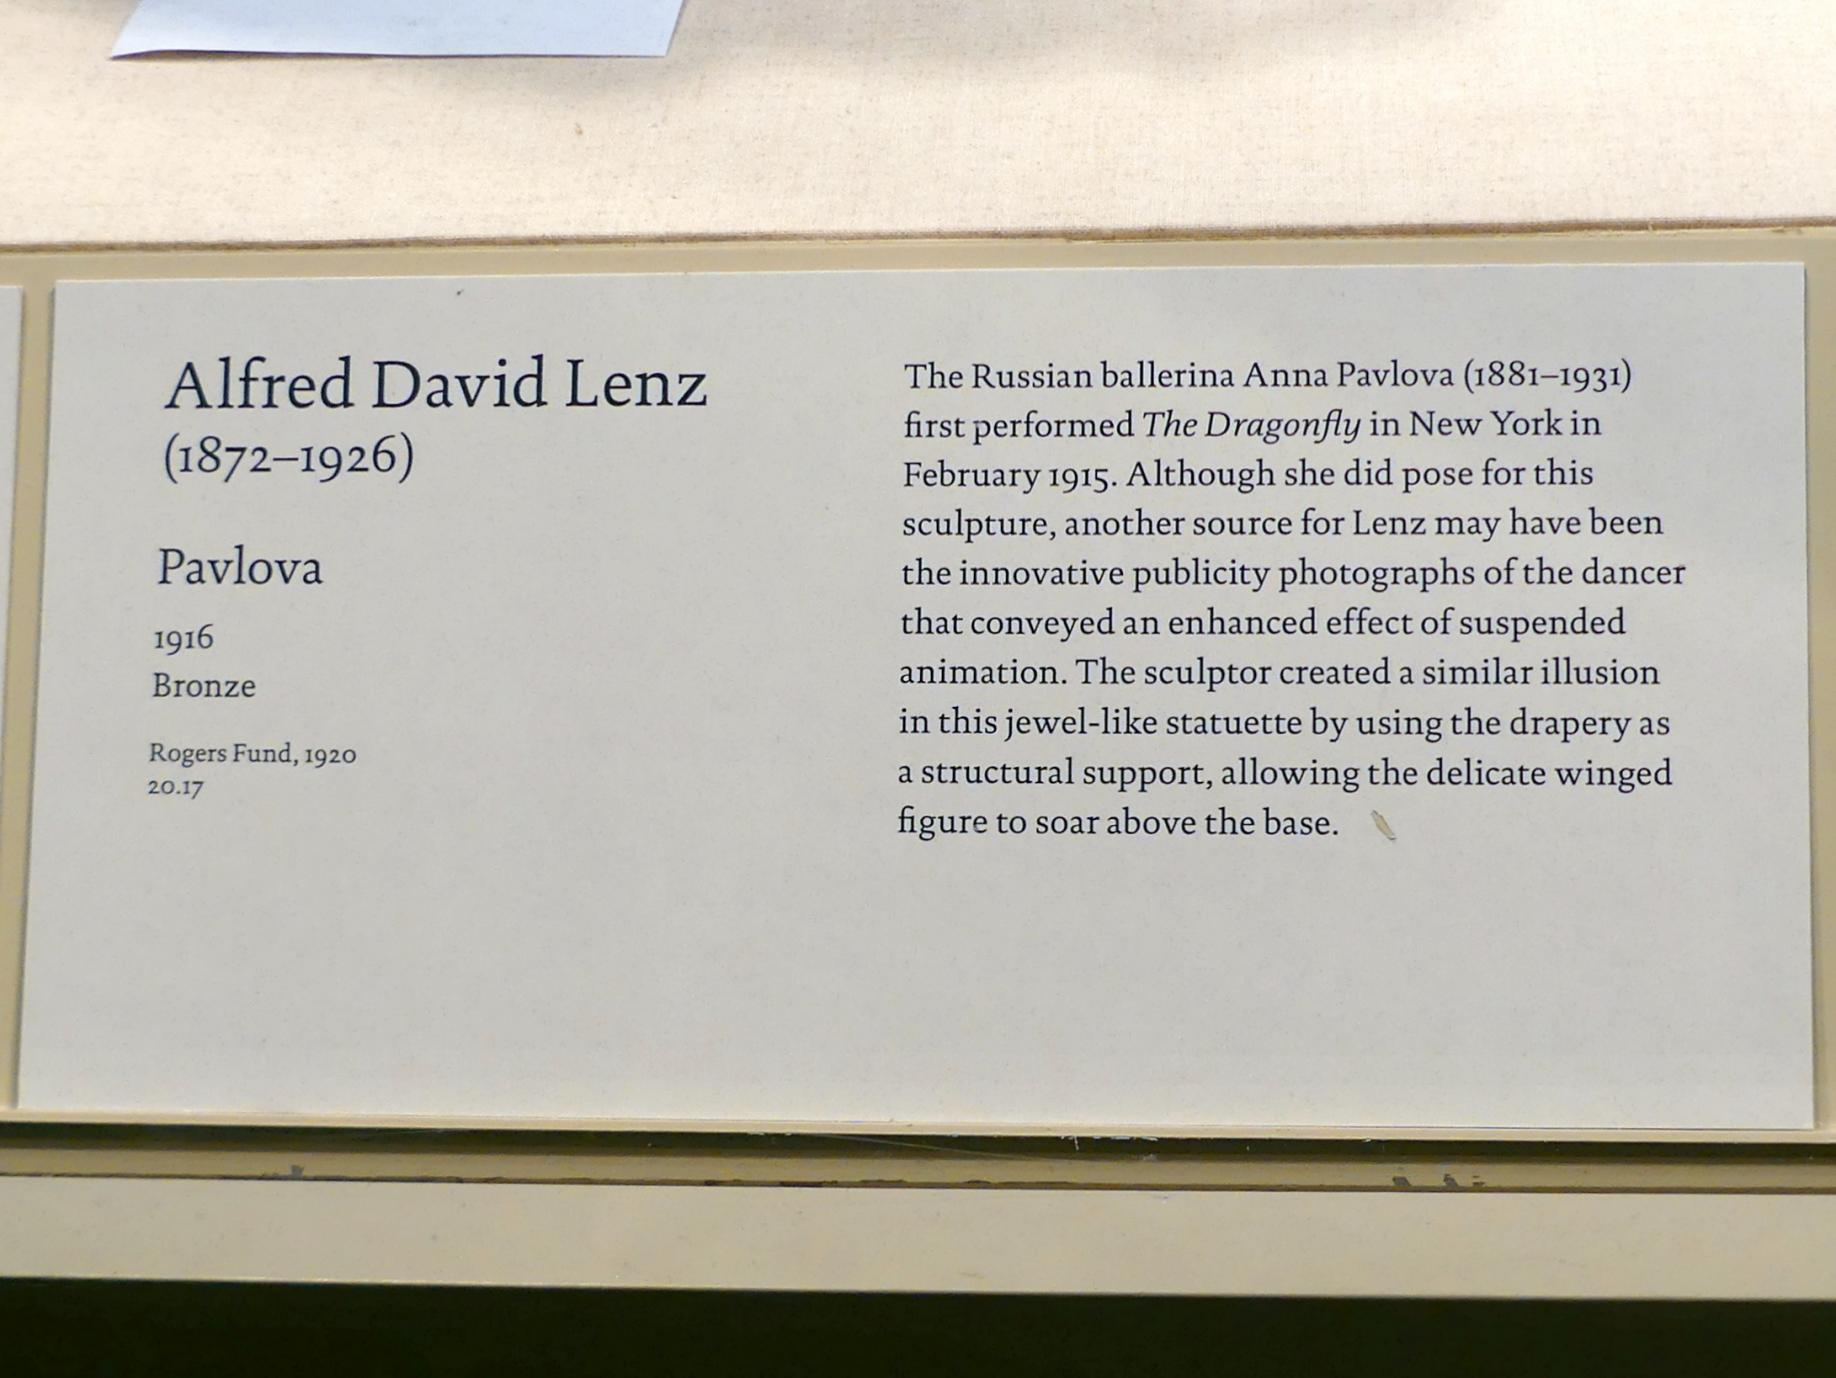 Alfred David Lenz: Pavlova, 1916